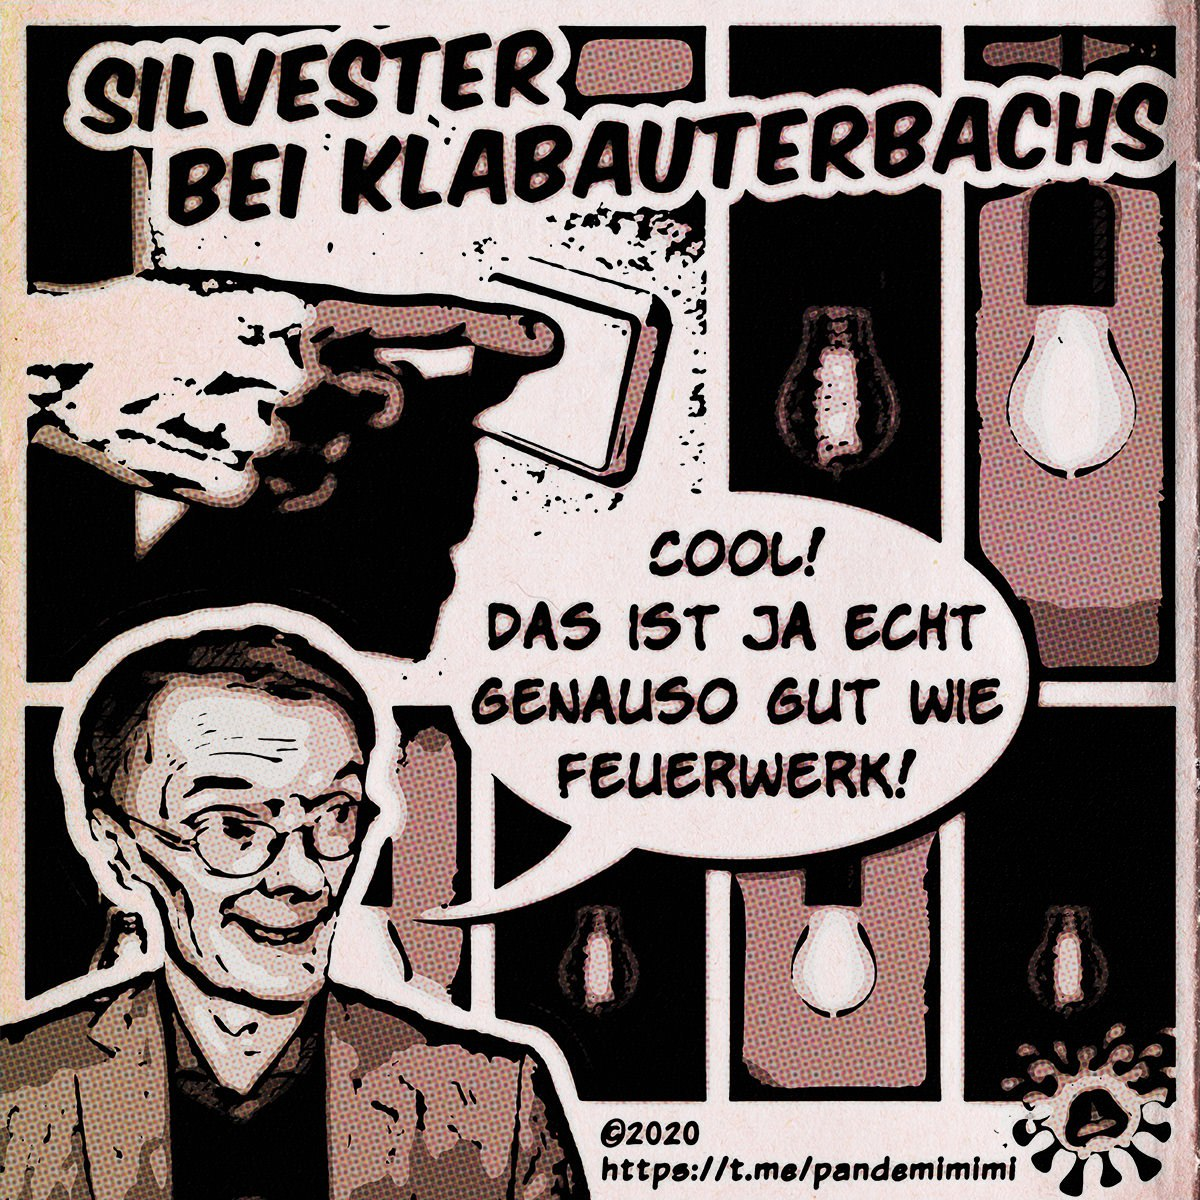 Silvester bei Klabauterbachs, 30.12.2020